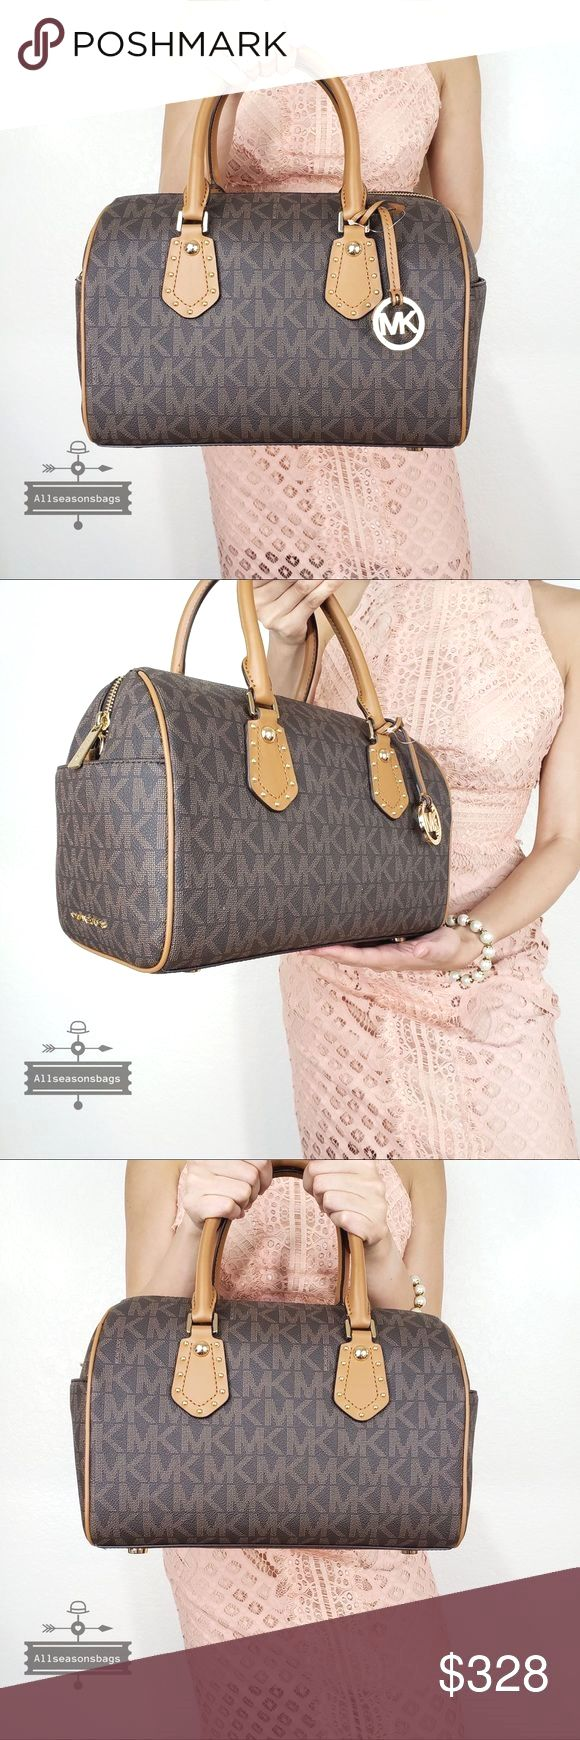 b950aecd4c29 NWT Michael Kors aria medium satchel brown acorn 100% Authentic Michael  Kors ARIA MD MONOGRAM SIGNATURE STUDDED SATCHEL HANDBAG in navy white Style  ...